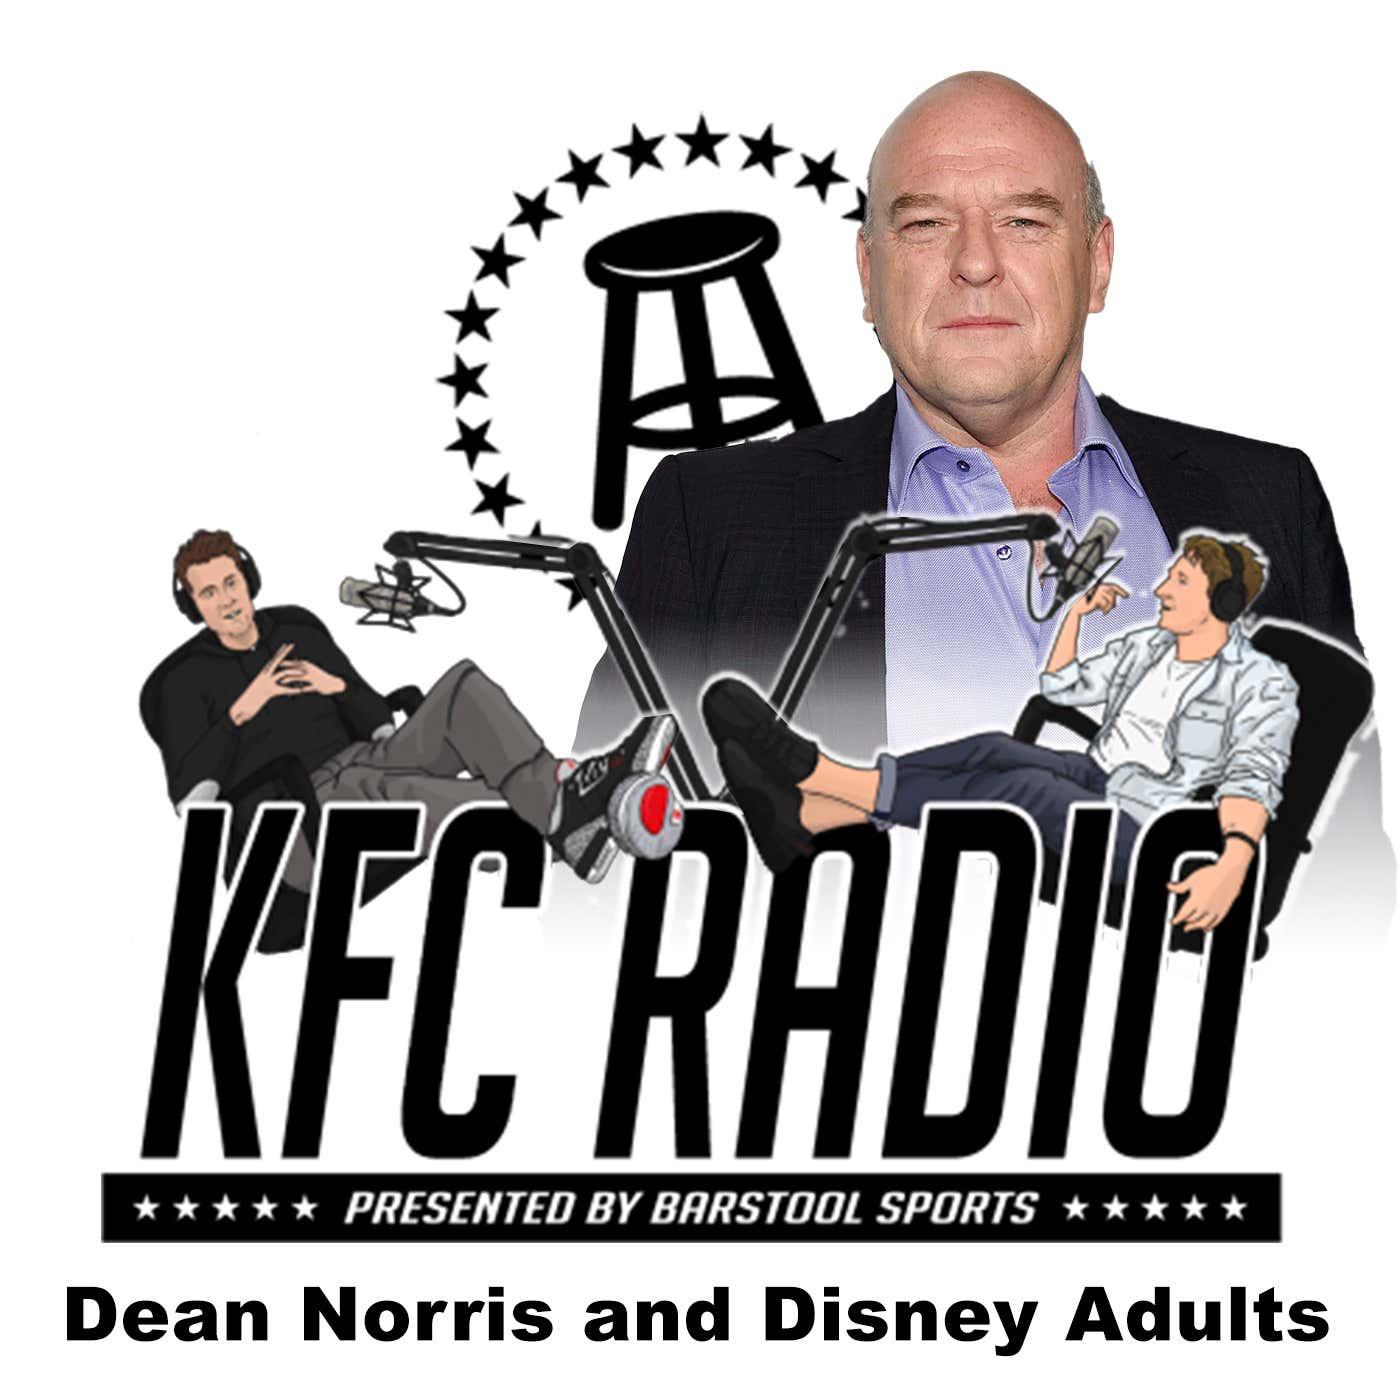 Dean Norris & Disney Adults